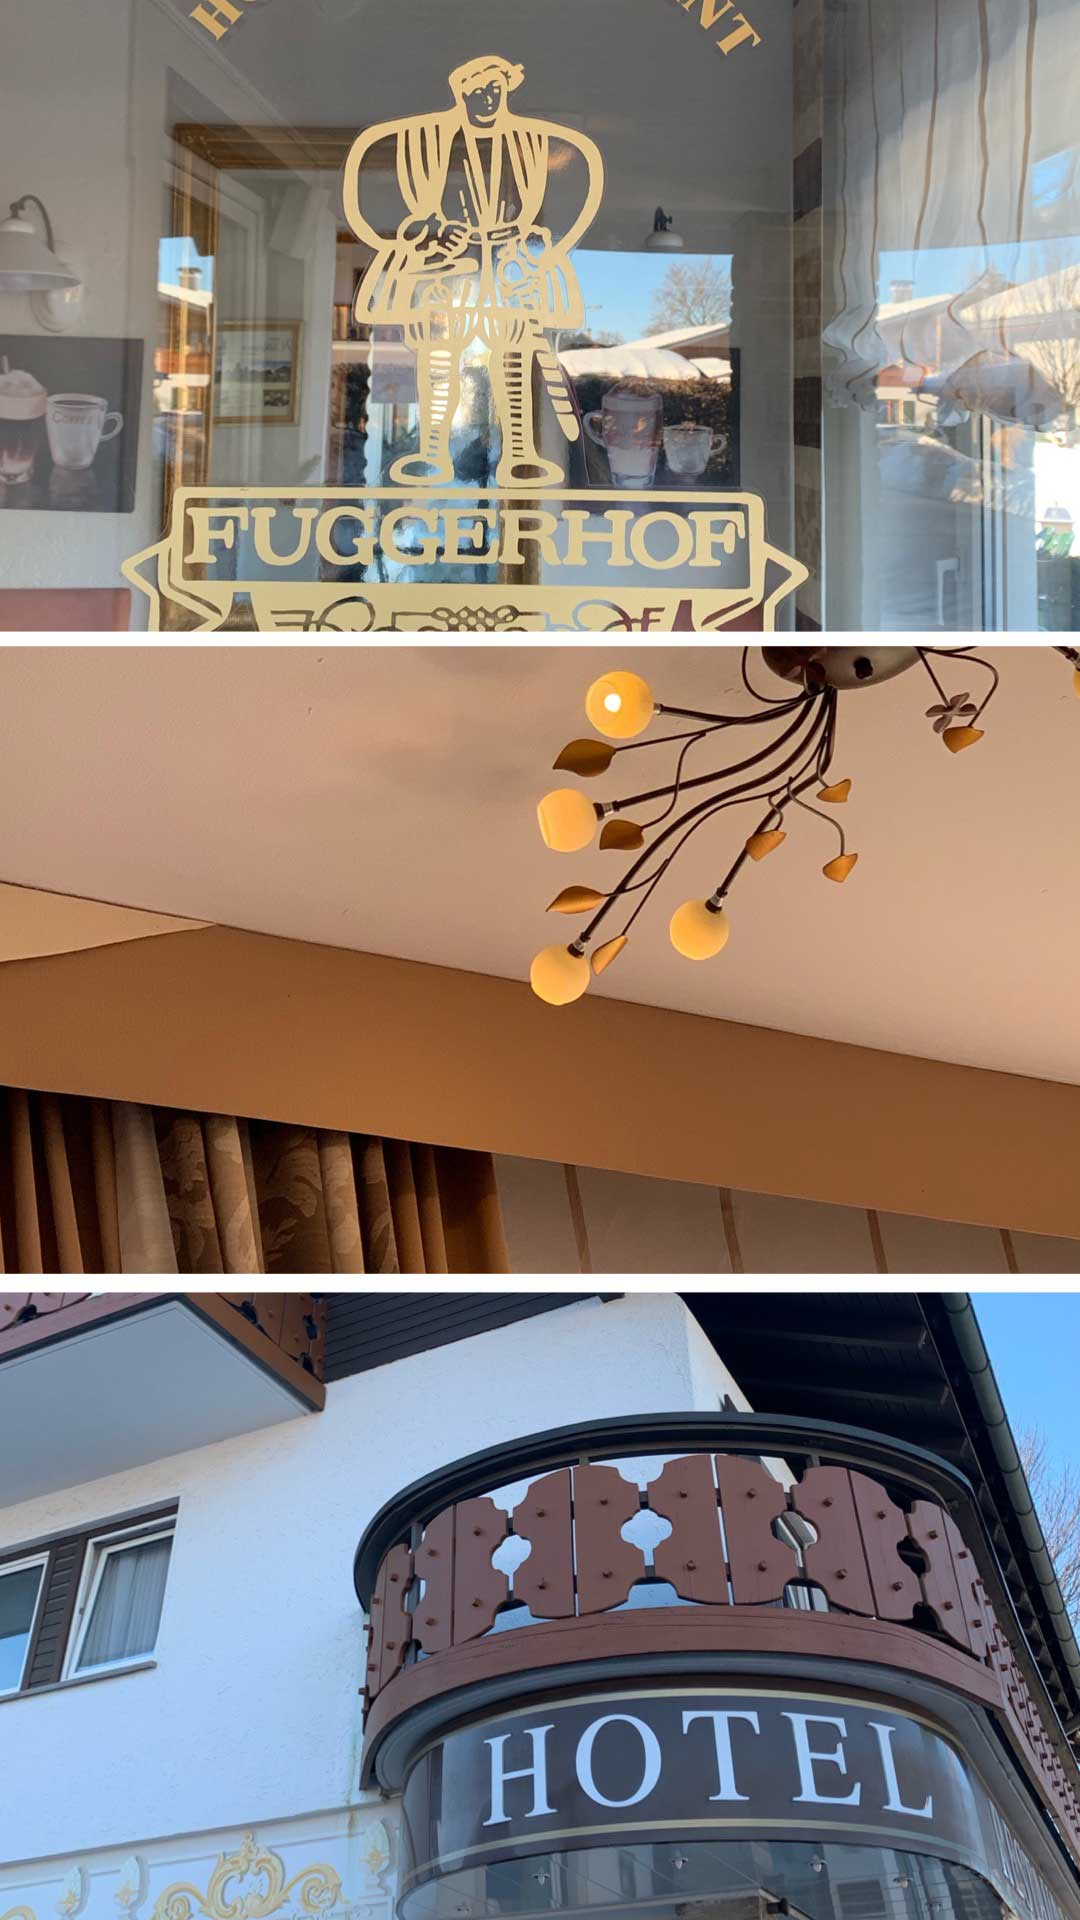 oberstdorf-hotel-fuggerhof